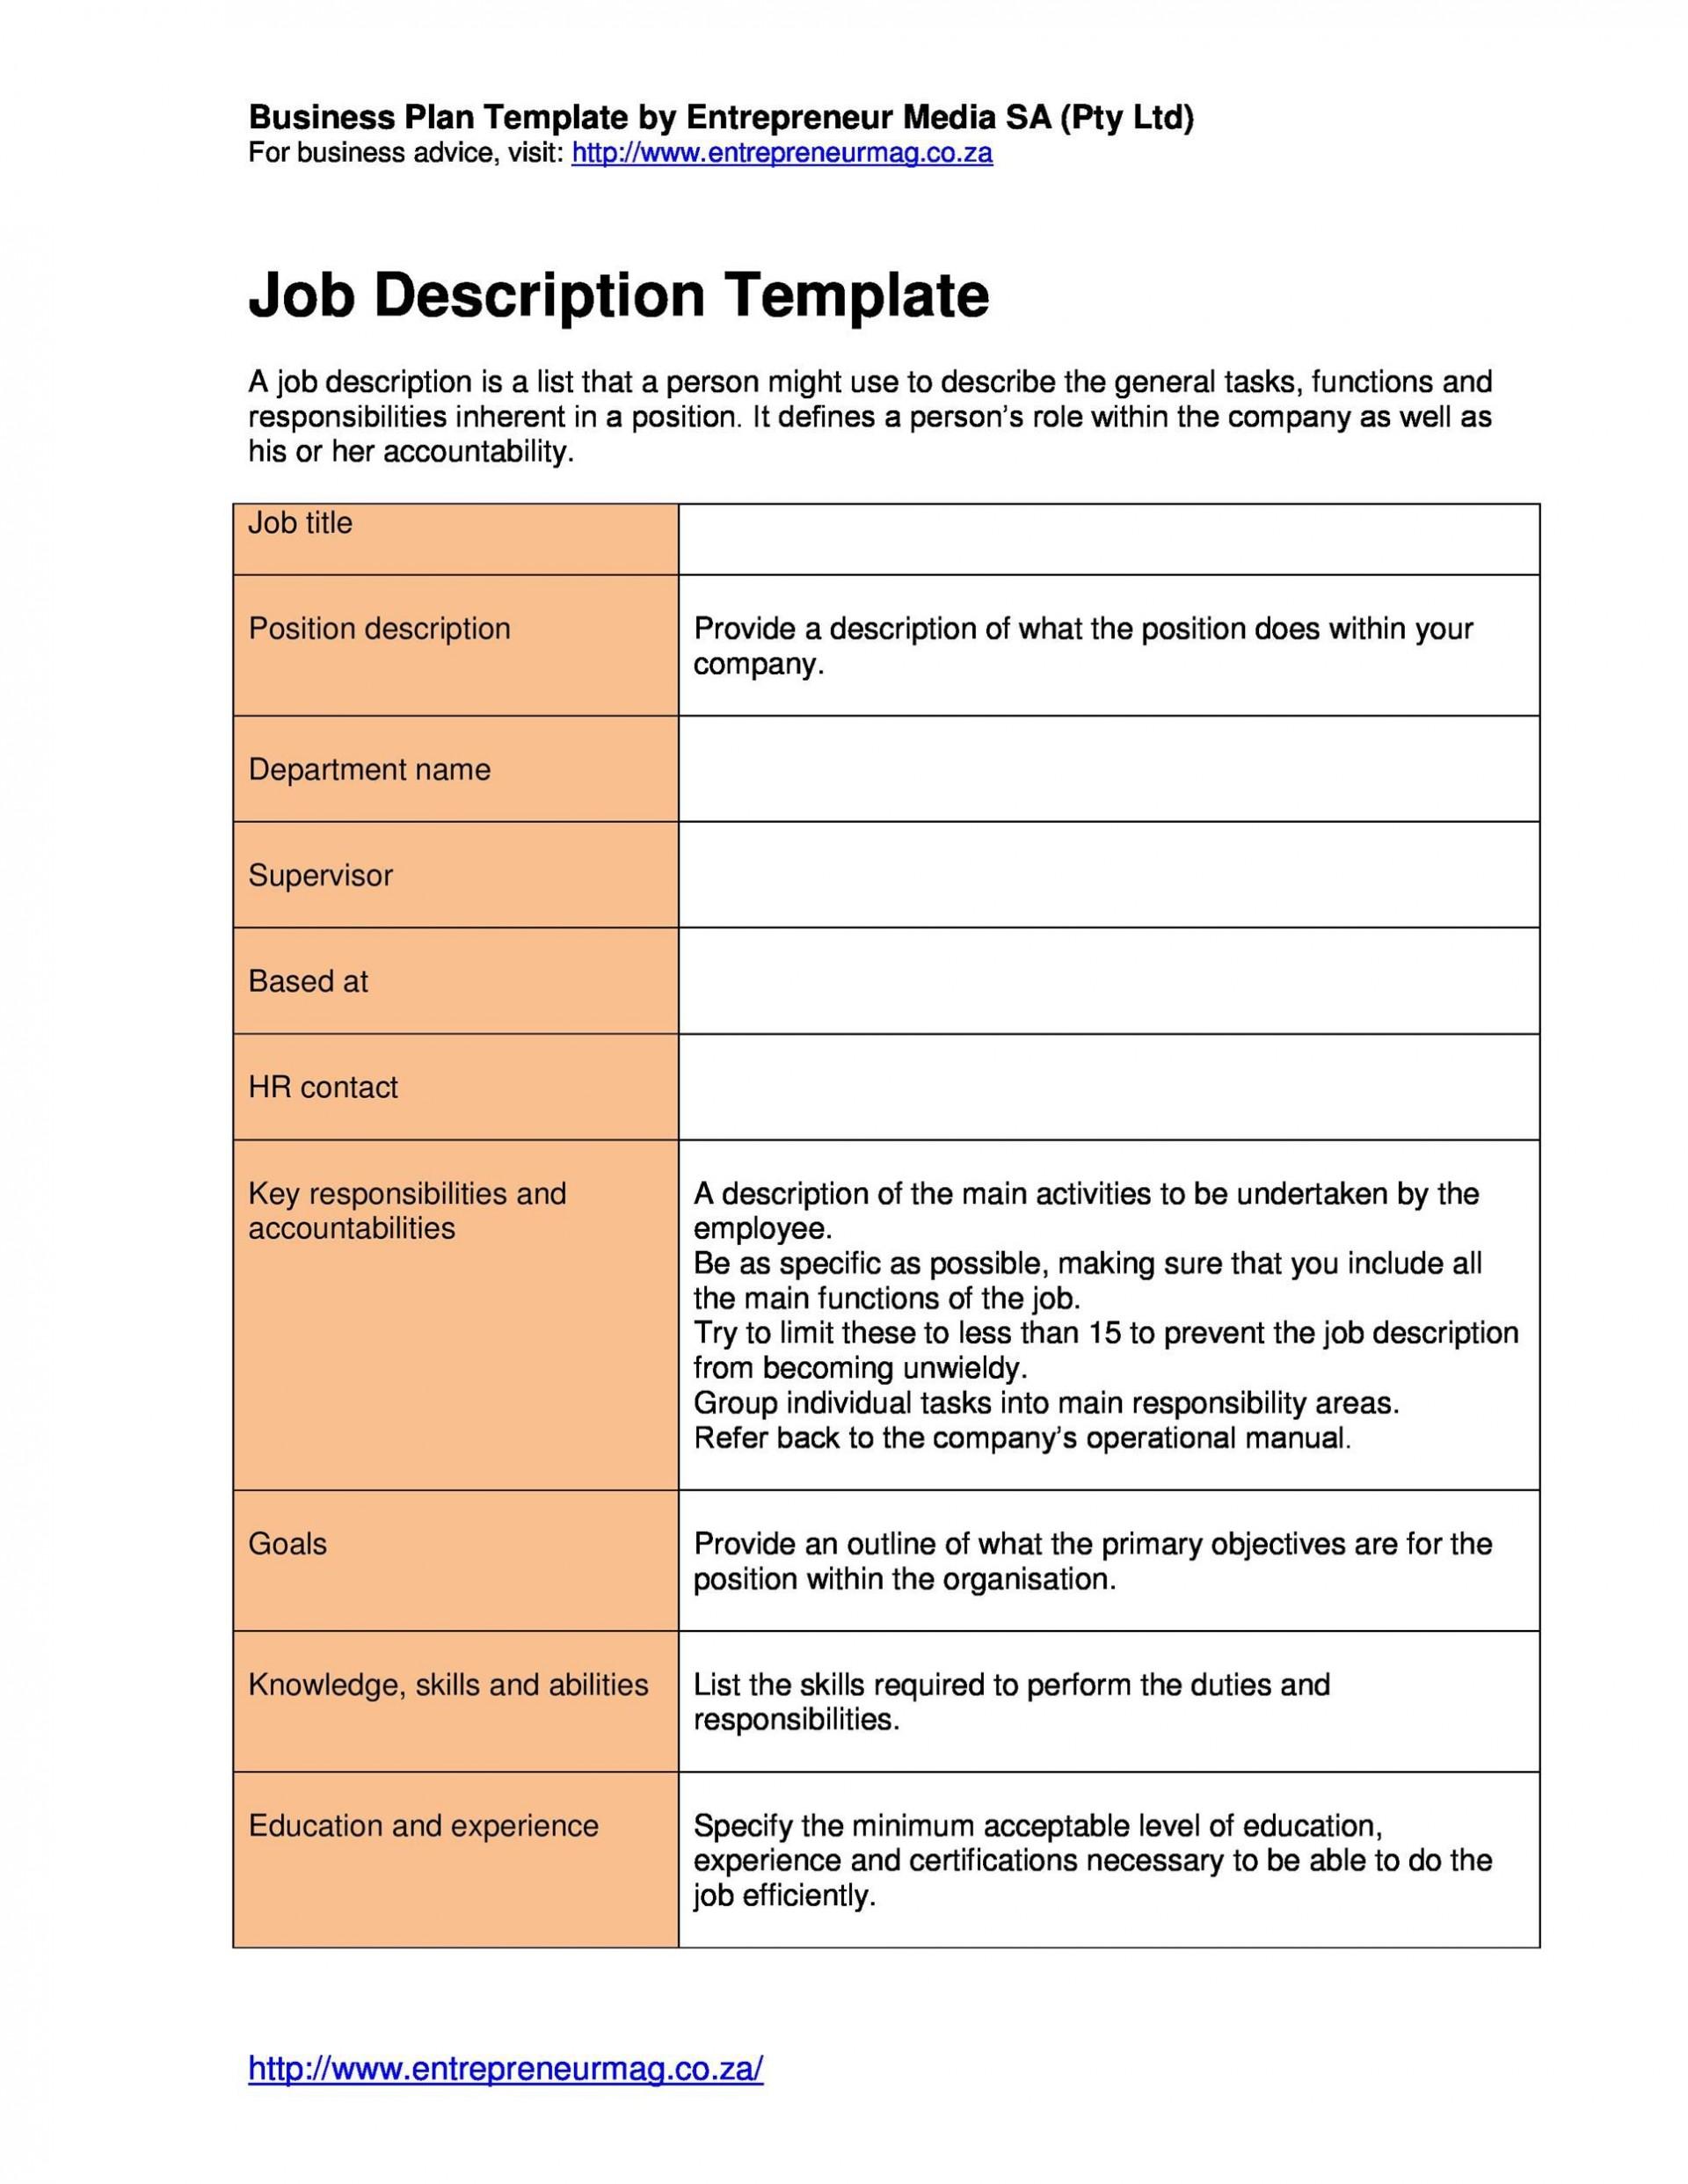 006 Wondrou Role And Responsibilitie Template Doc Image  Google1920